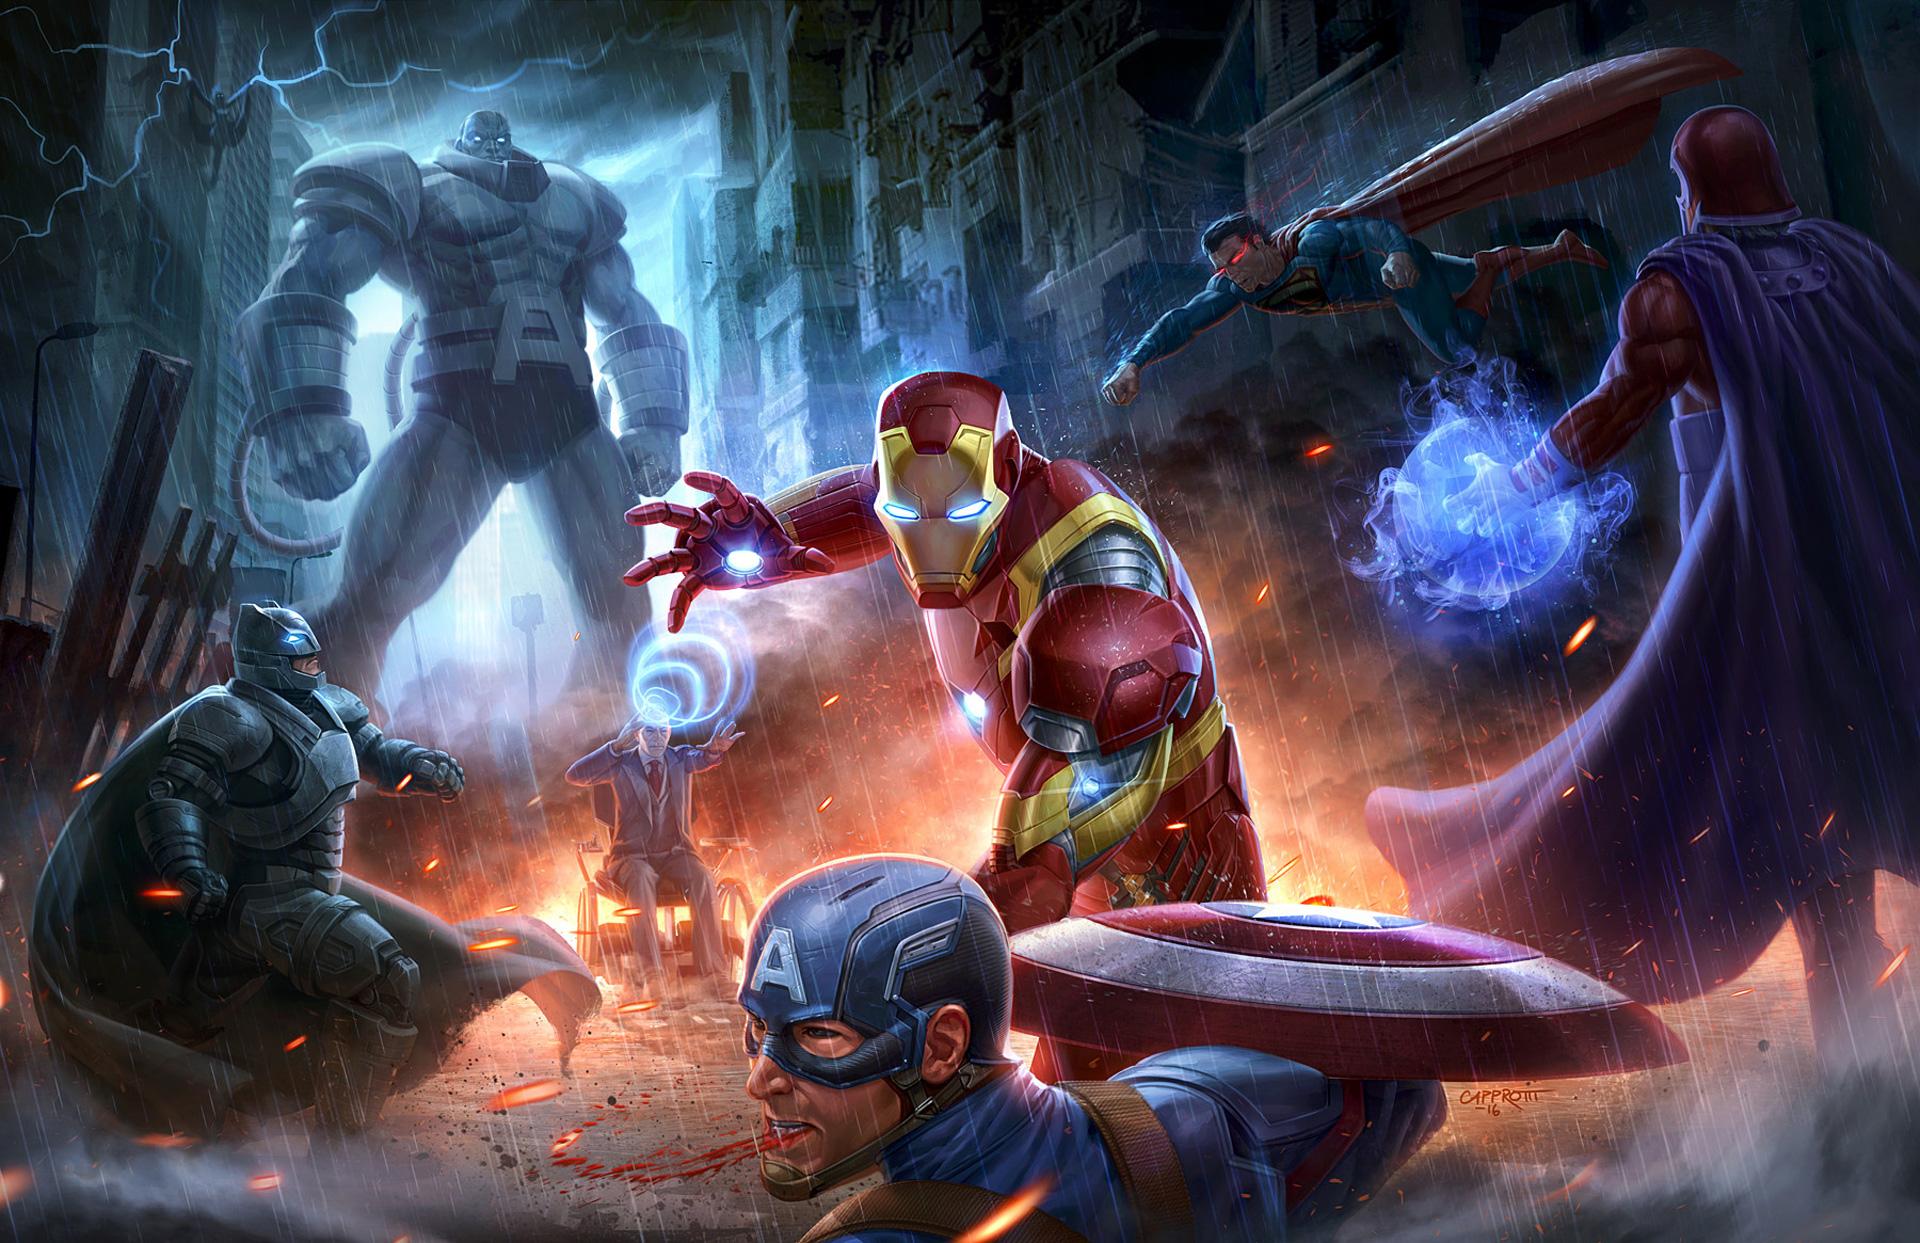 marvel avengers vs dc justice league  hd superheroes  4k wallpapers  images  backgrounds  photos